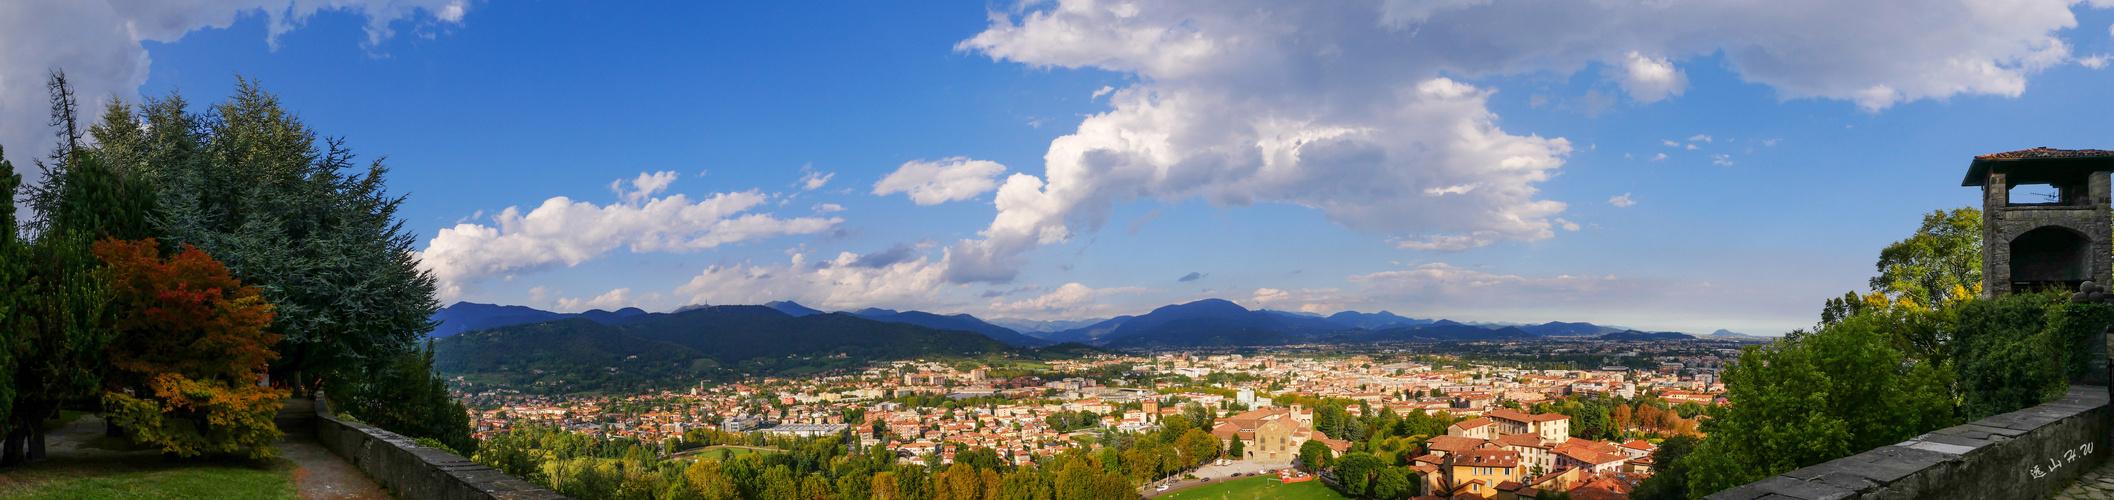 Bergamo,Italy